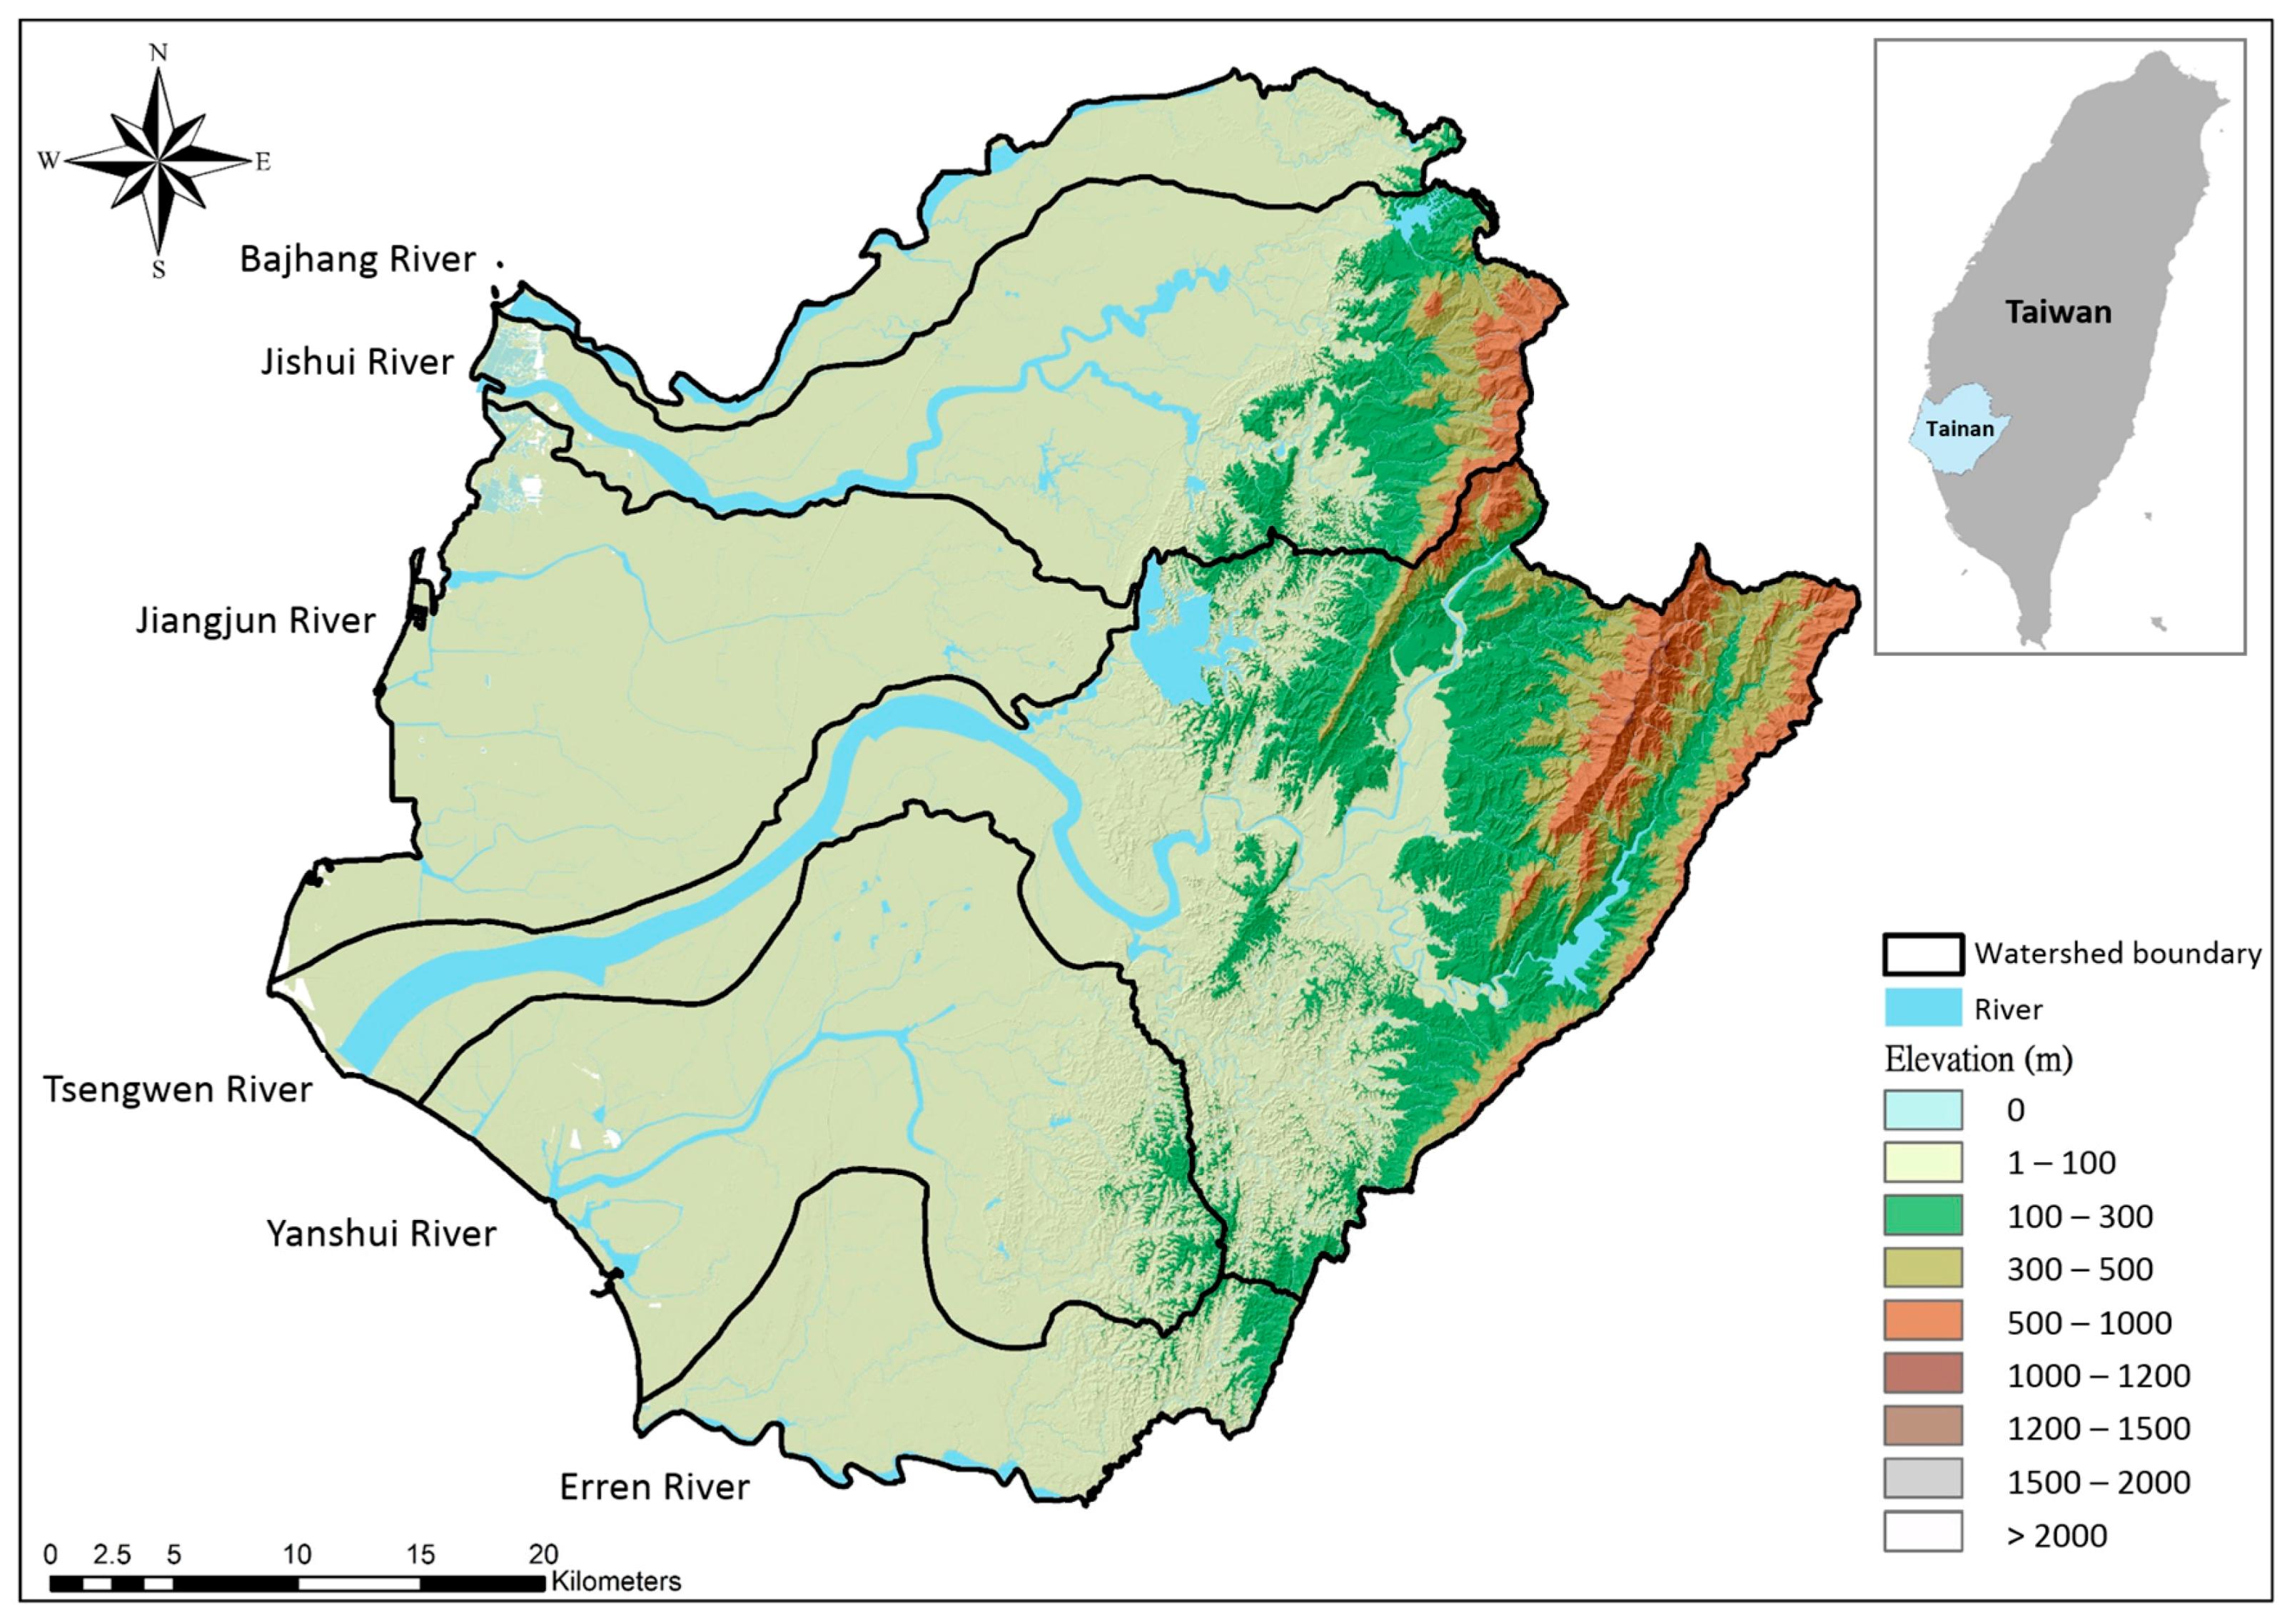 Water Free FullText Development of a New Generation of Flood